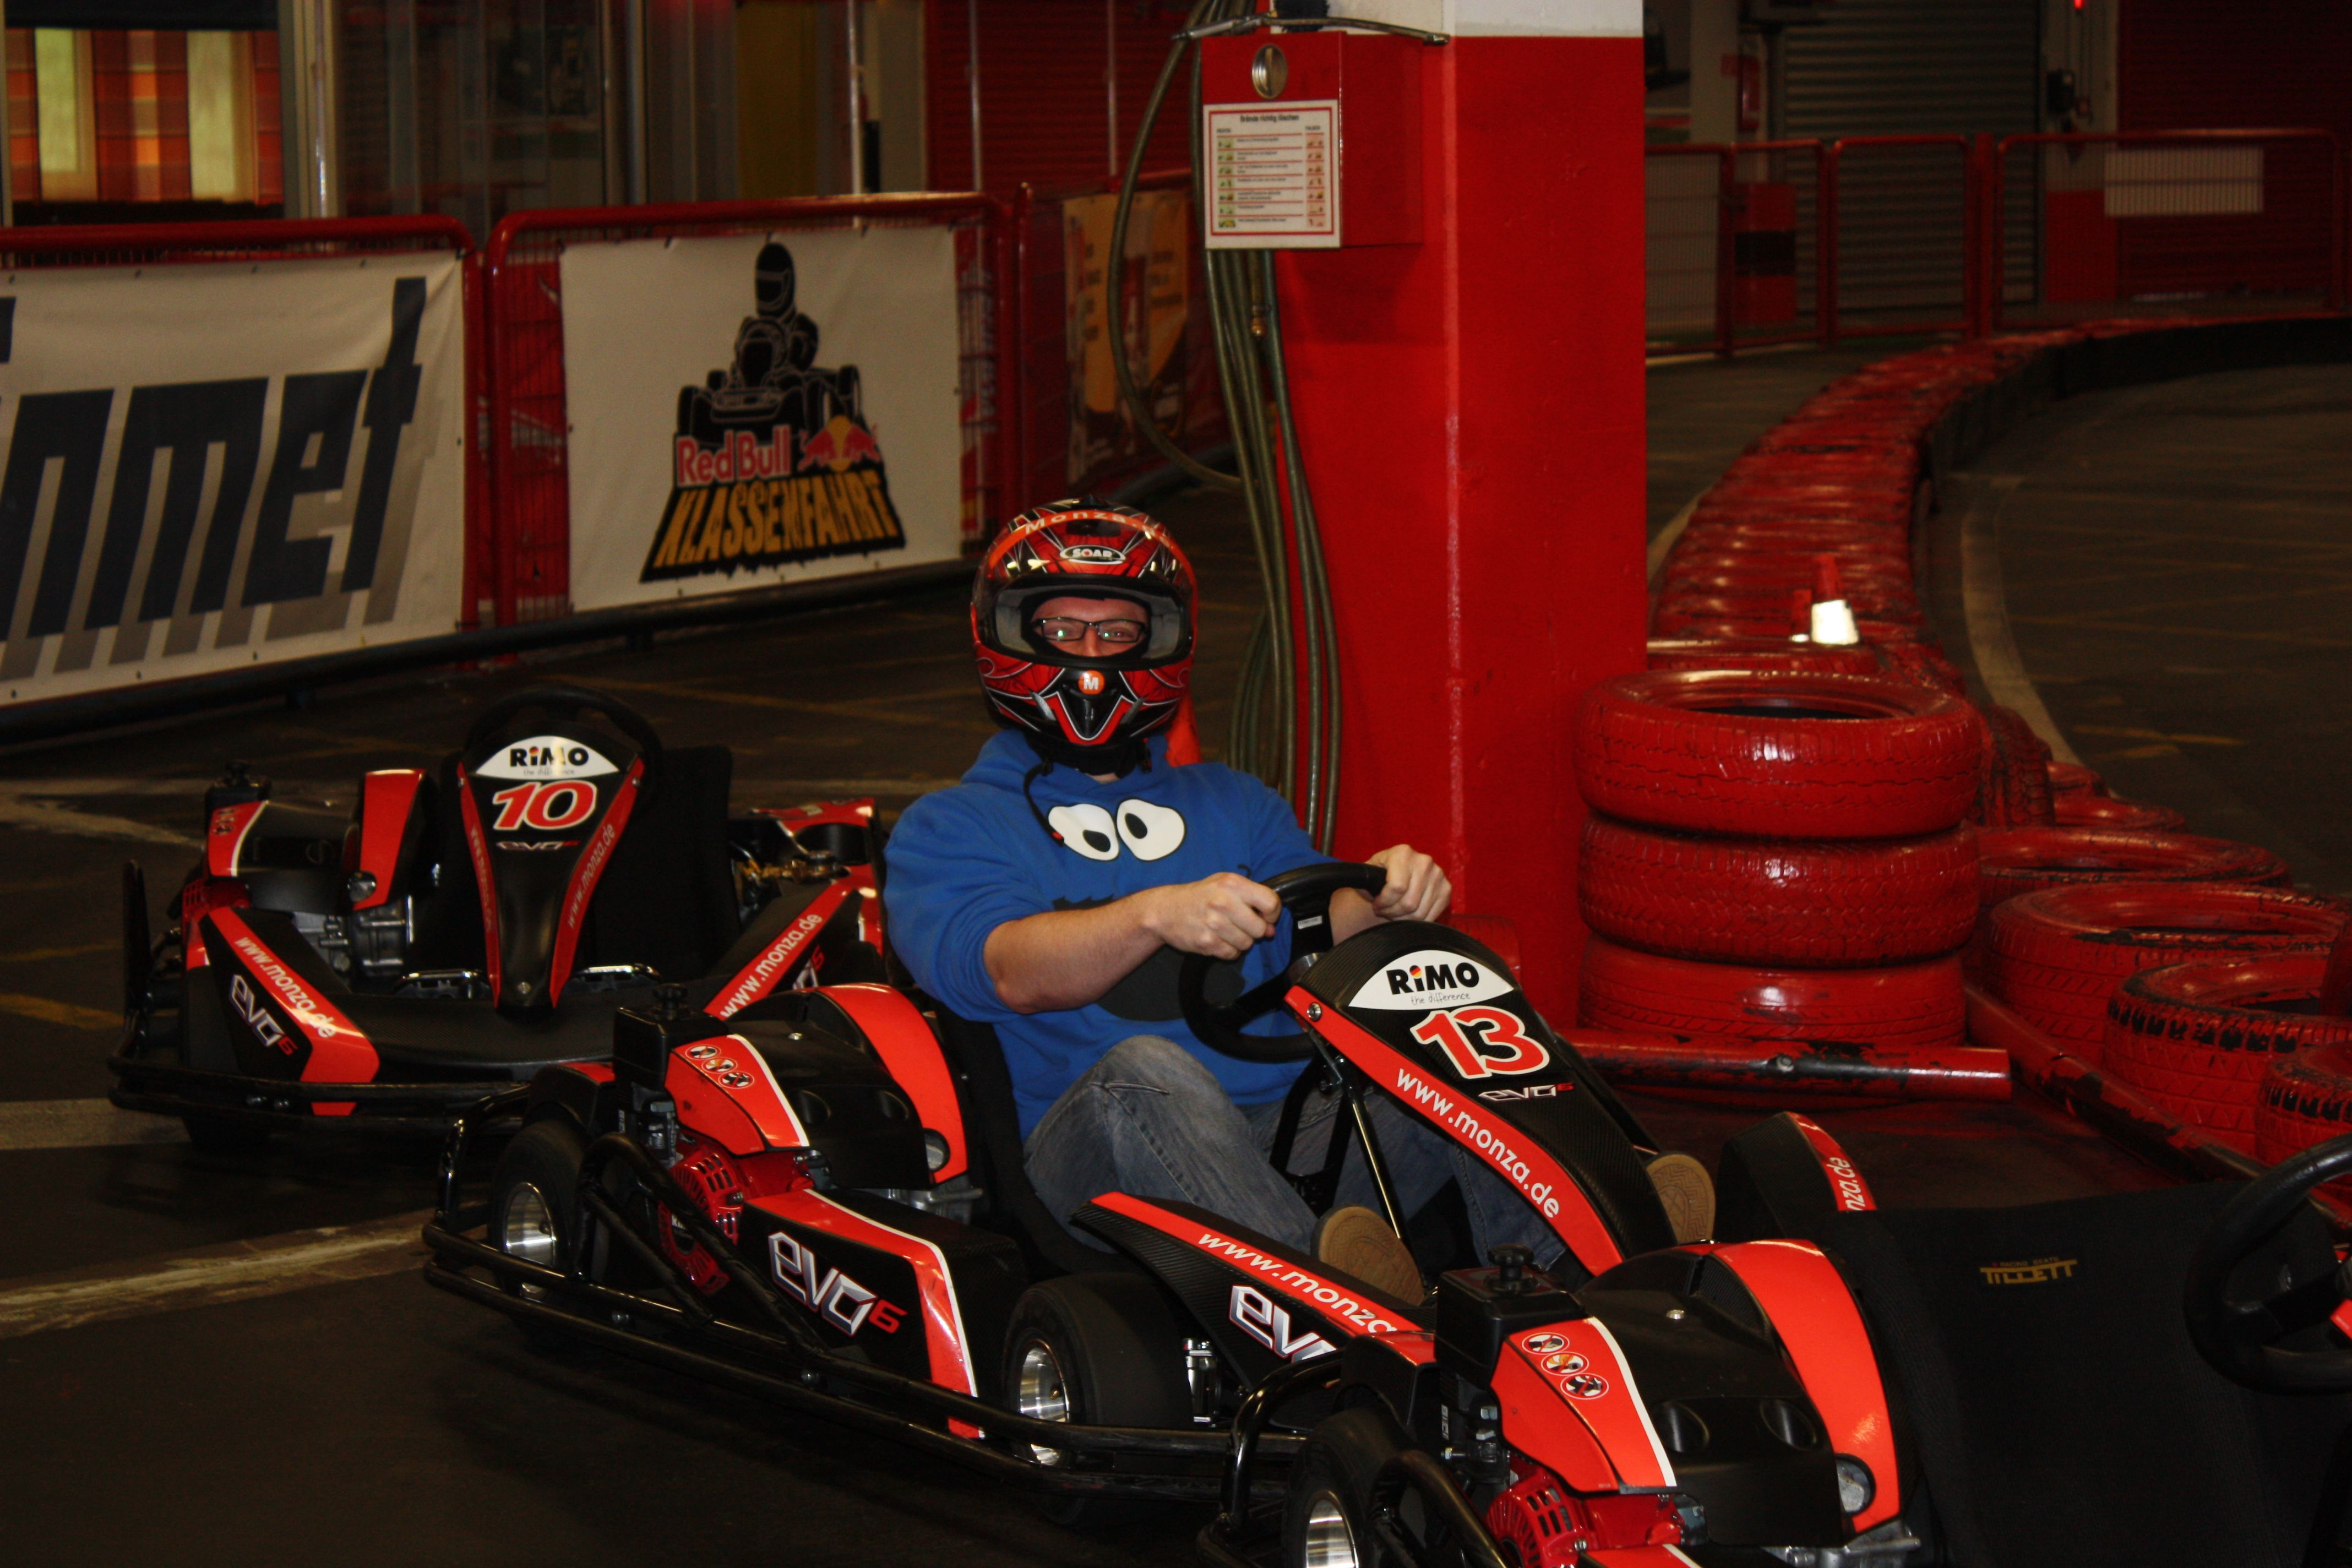 Kartfahren - Ich bin bereit - hupp hupp